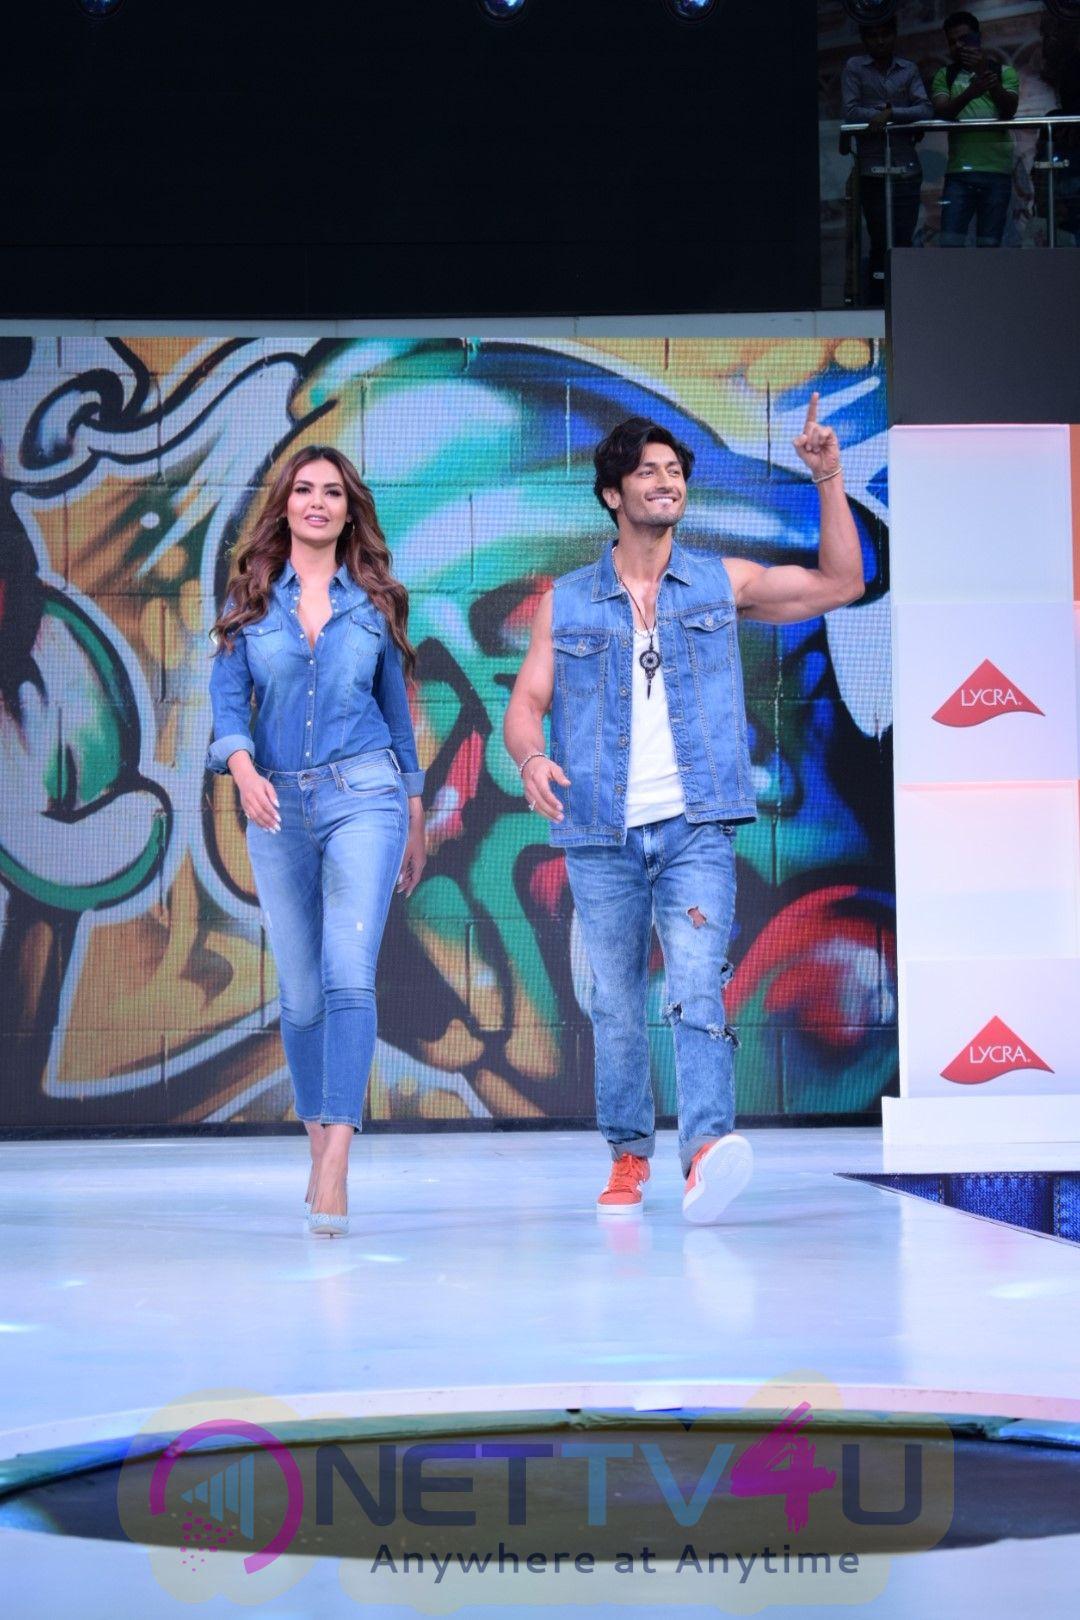 EshaGupta & Vidyut Jammwal Attended The Fashion Show